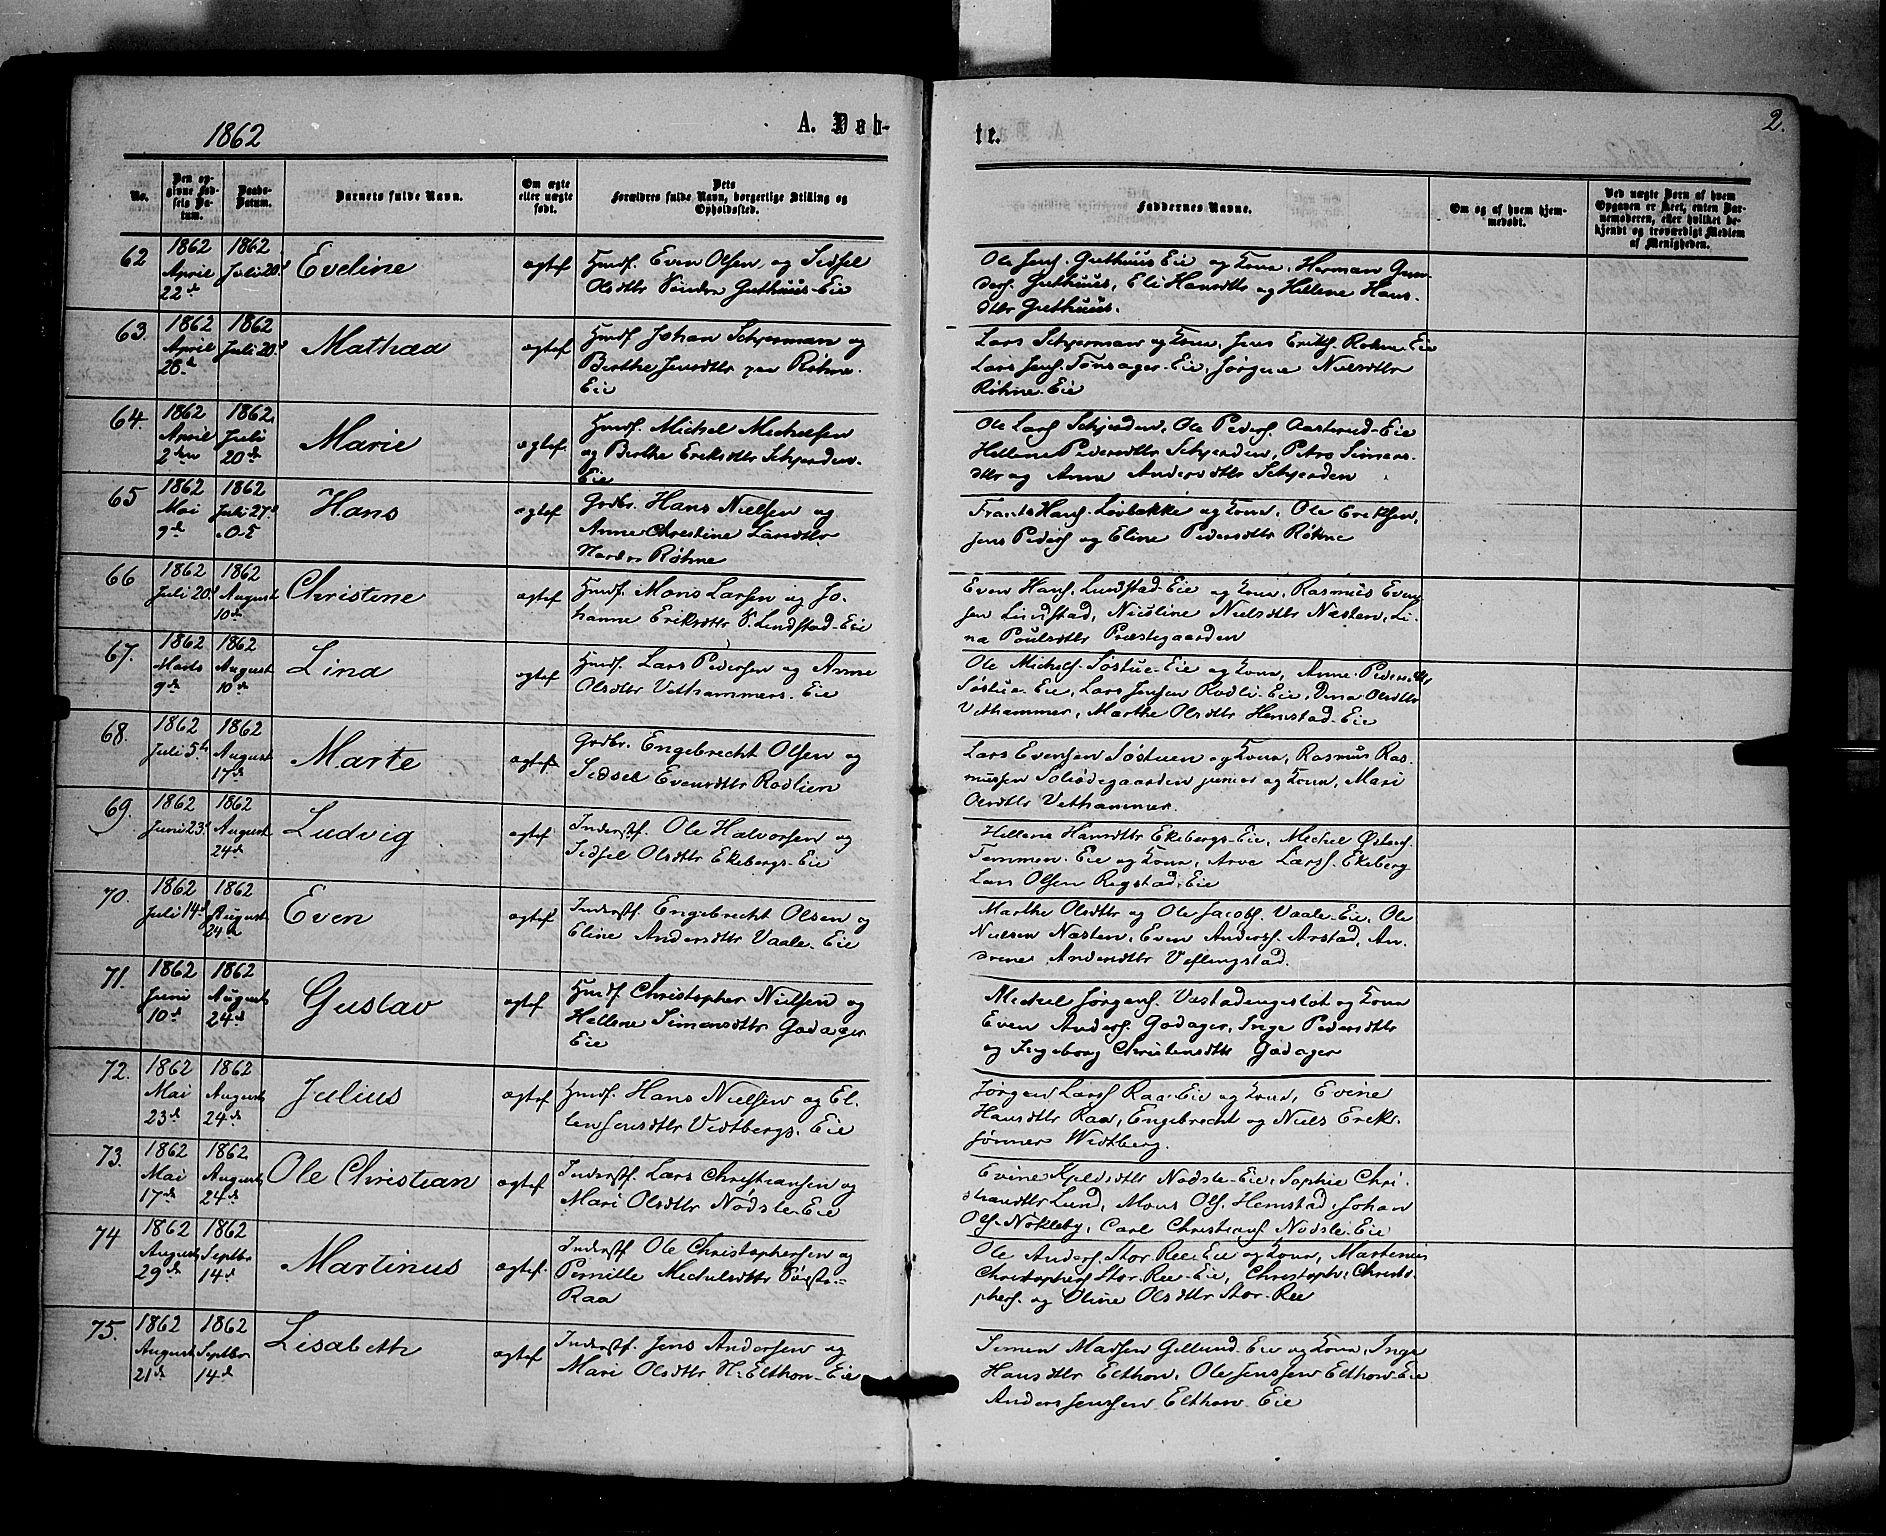 SAH, Stange prestekontor, K/L0013: Ministerialbok nr. 13, 1862-1879, s. 2